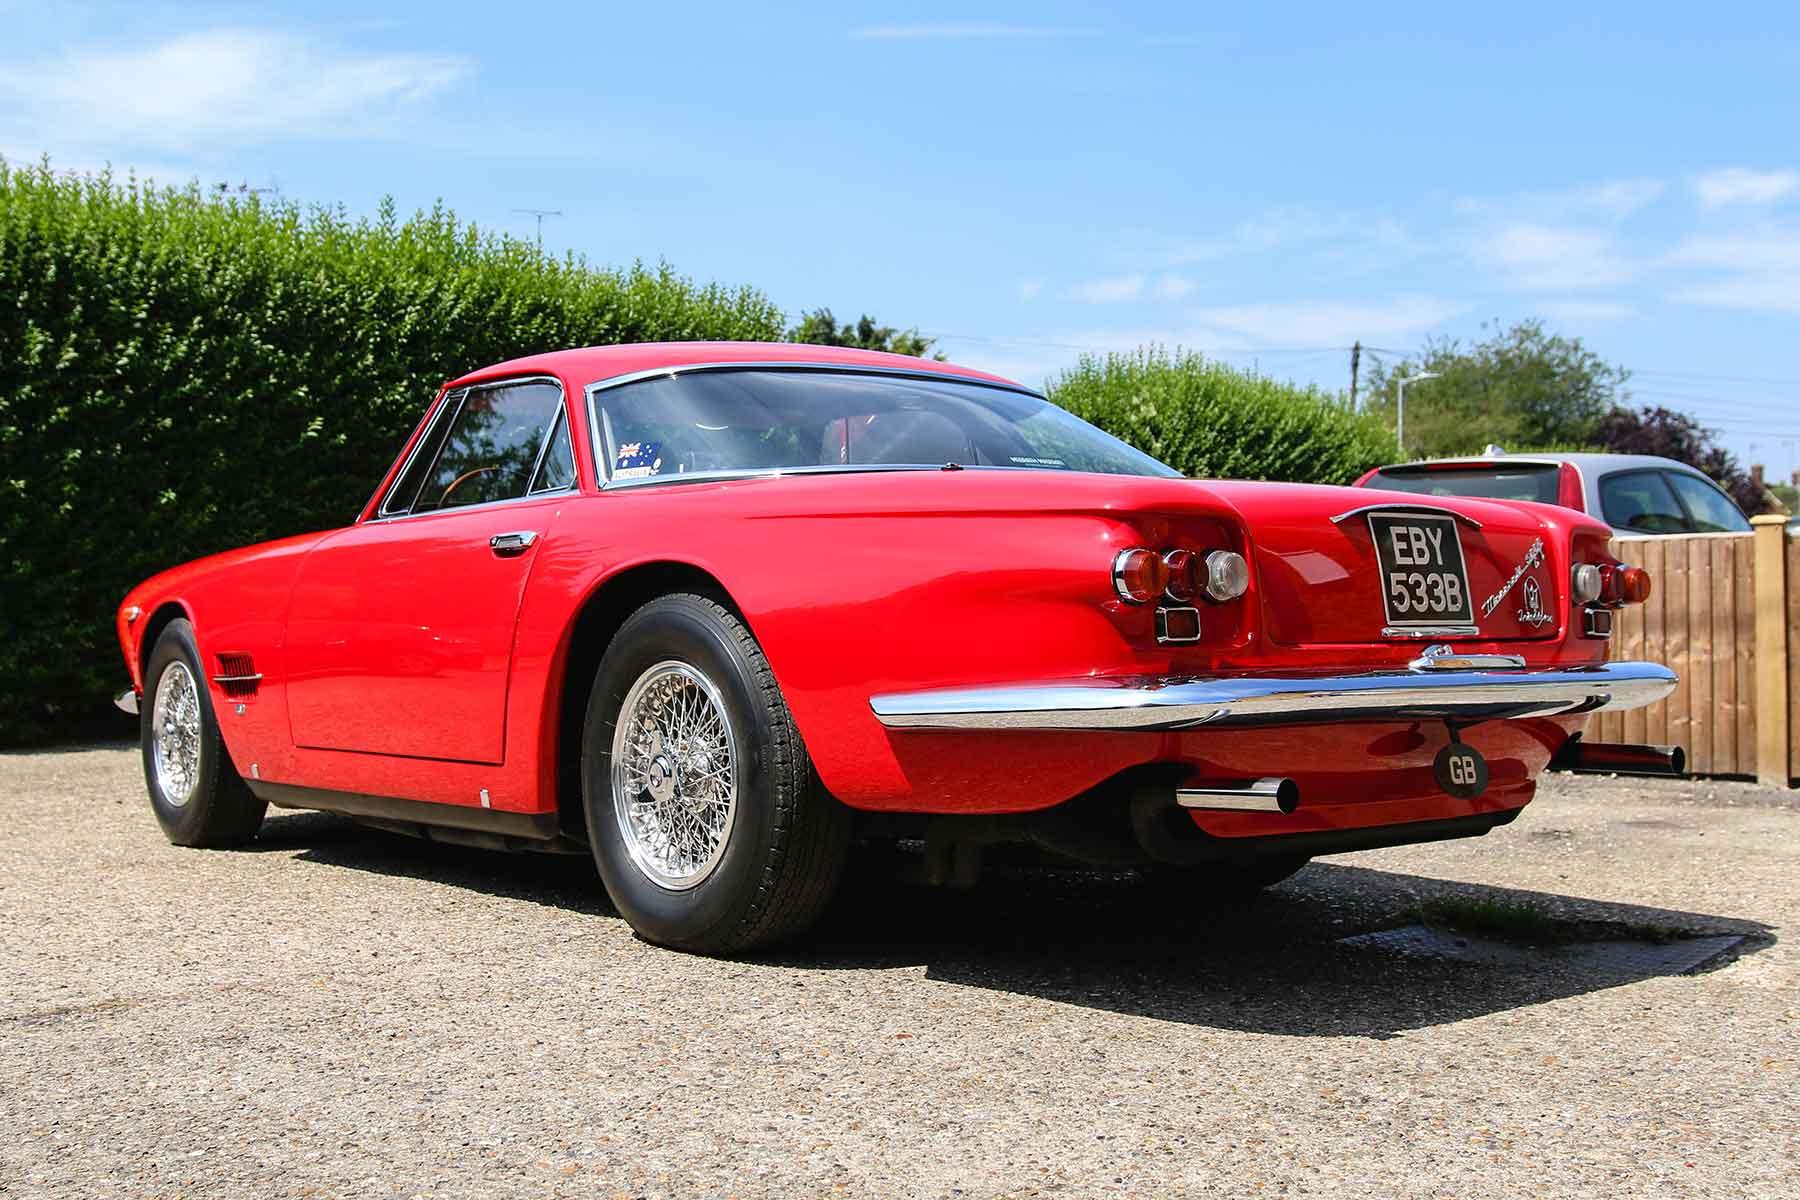 5000 GT